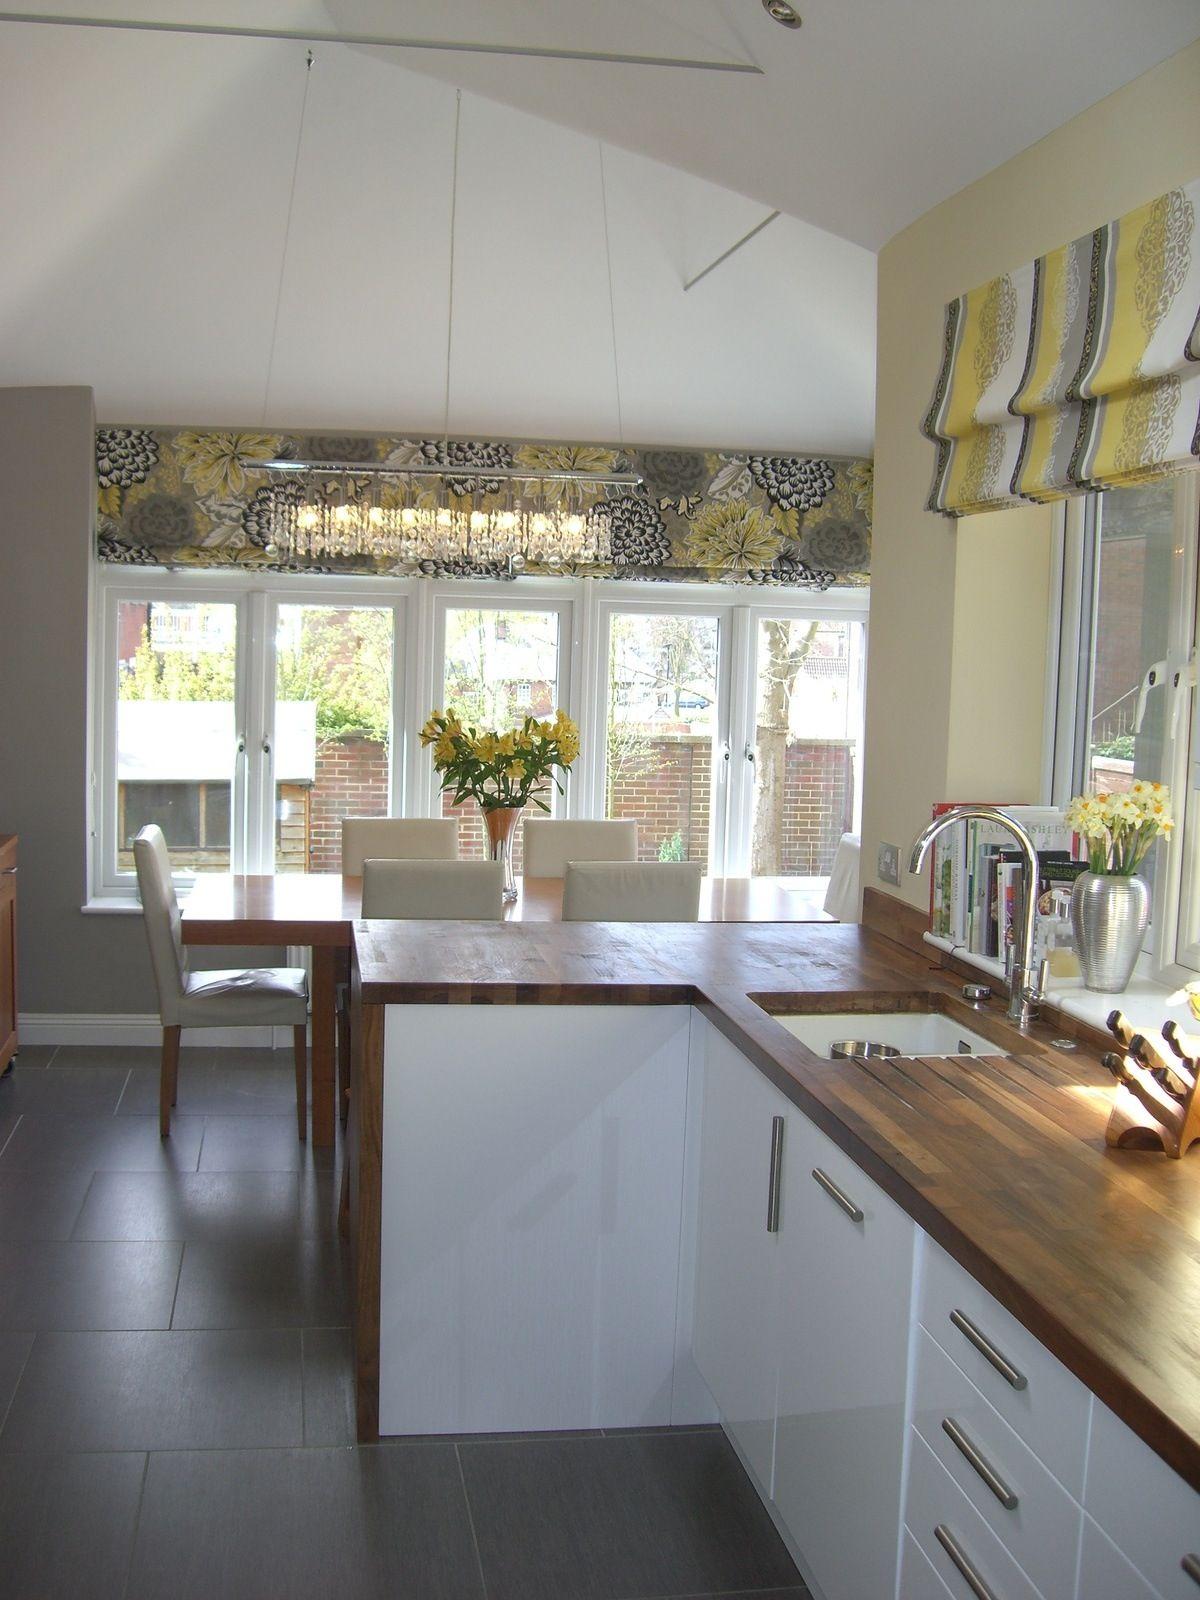 grey kitchen blinds small white cabinets design ideas decoracao cozinha conceito aberto yellow modern window walls